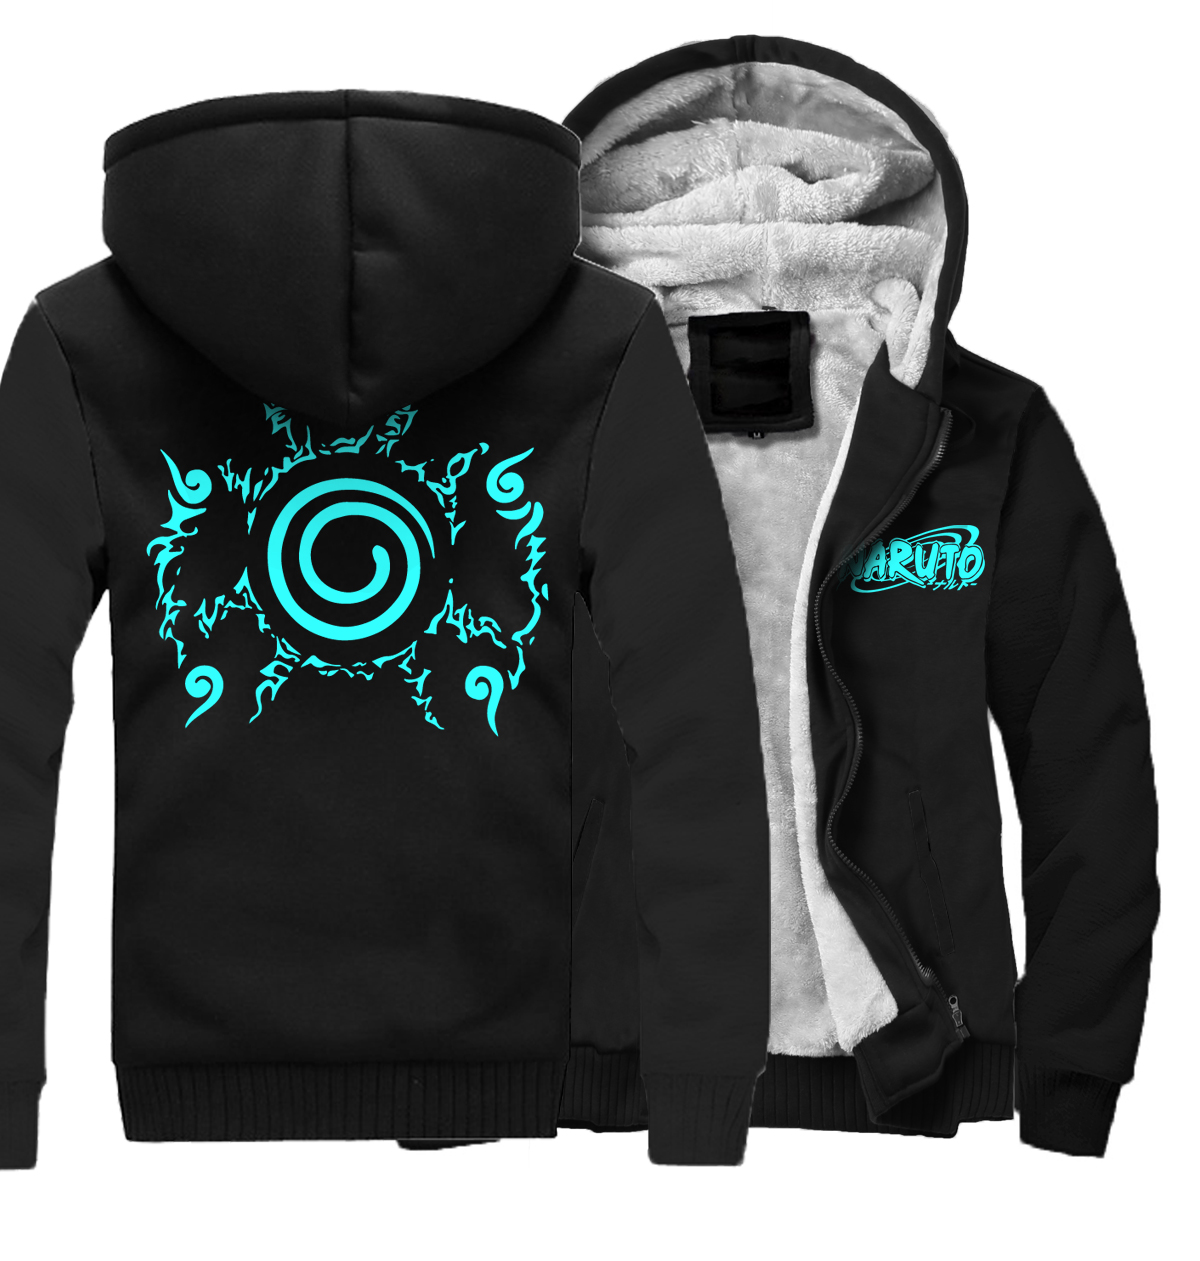 2018 Hot Sale Hoodies Men Fashion Brand Clothing Thick Sweatshirt Print Anime Naruto Cosplay Casual Hoody Sweatshirts Men Kpop